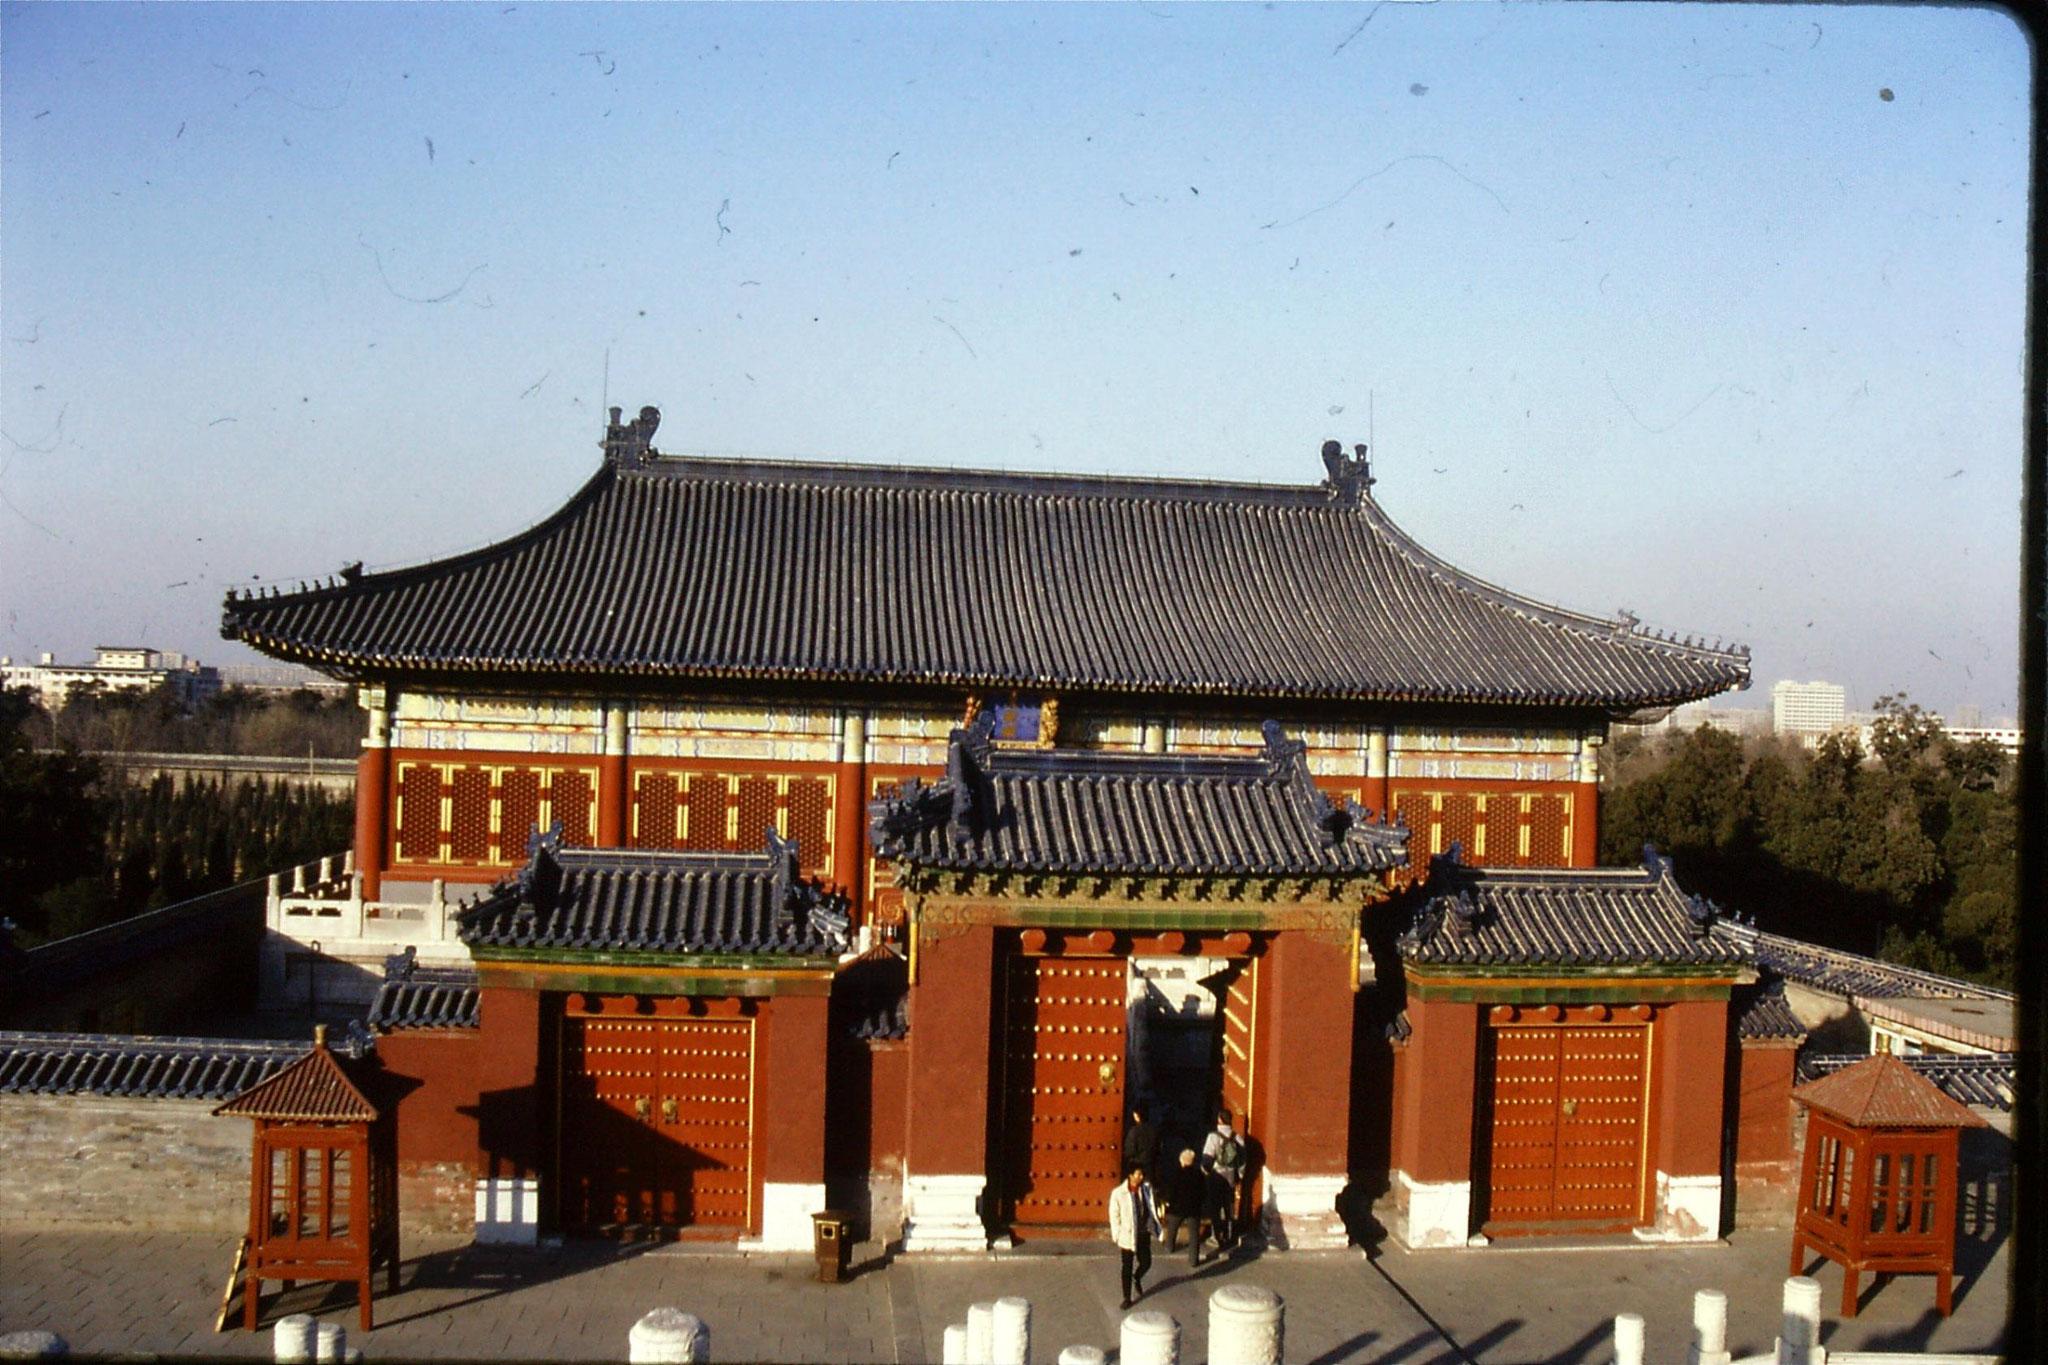 2/12/1988: 26: Tiantan Park